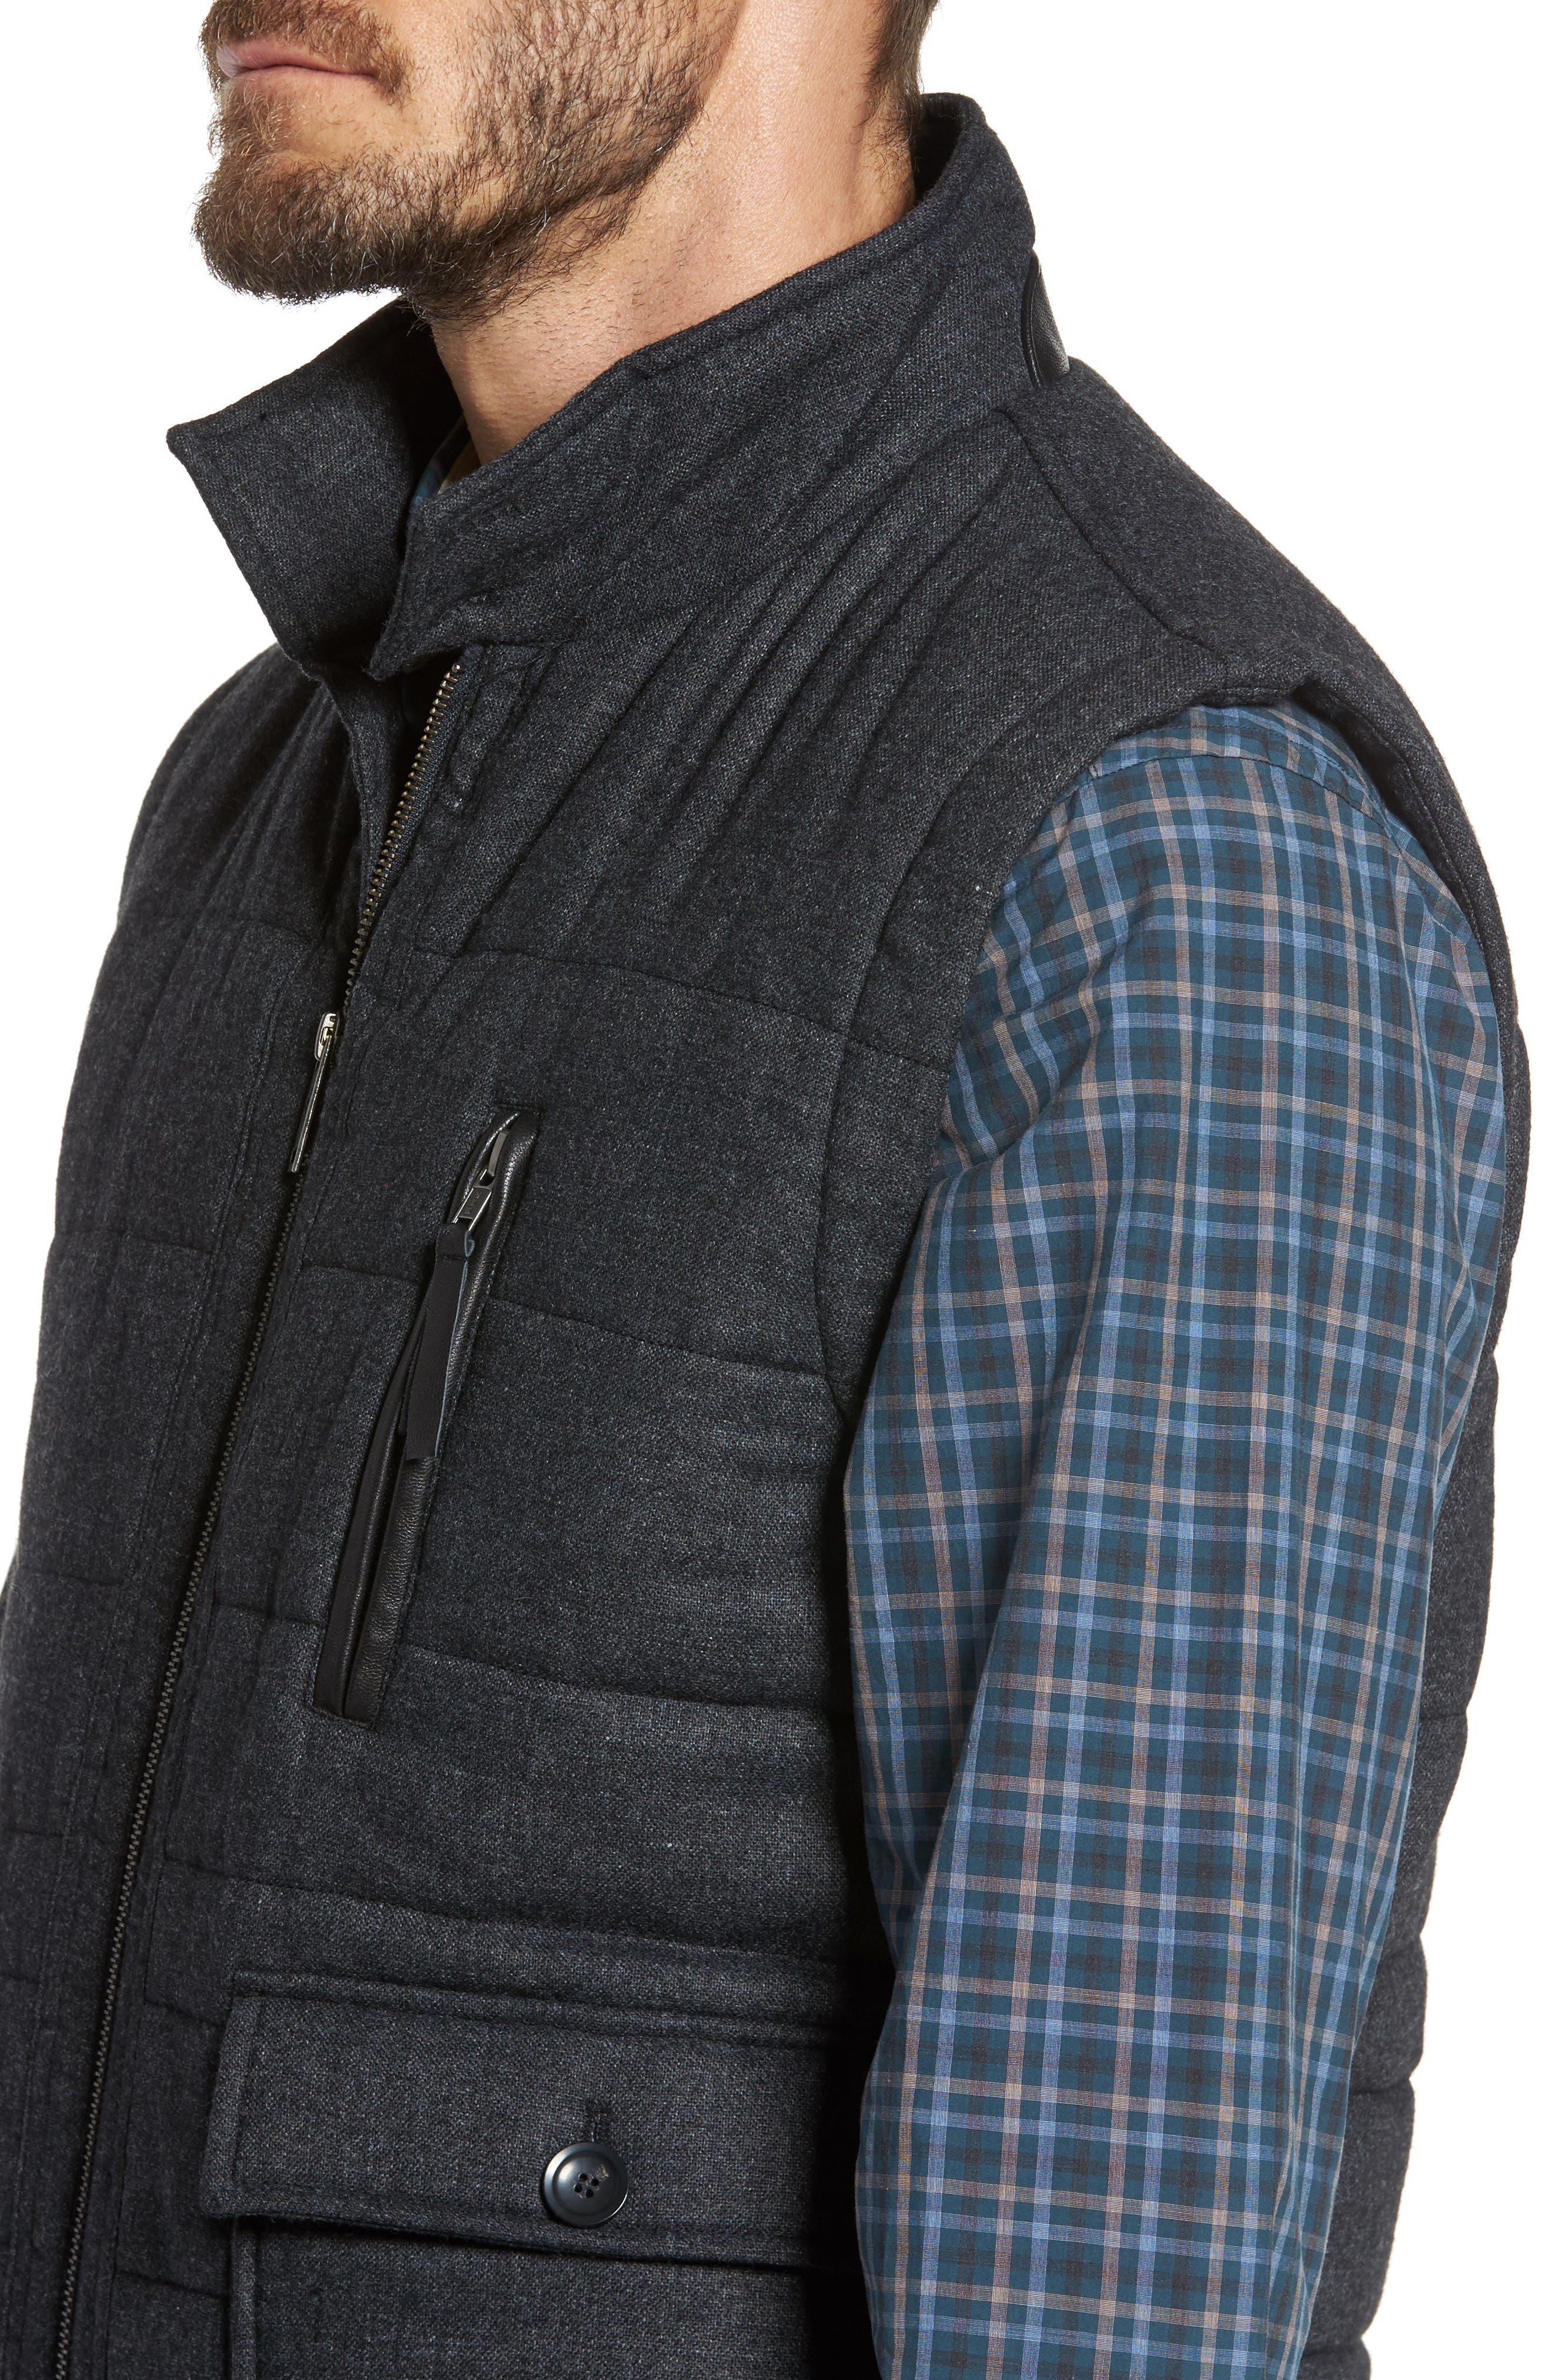 Johnsonville Quilted Vest,                             Alternate thumbnail 4, color,                             021